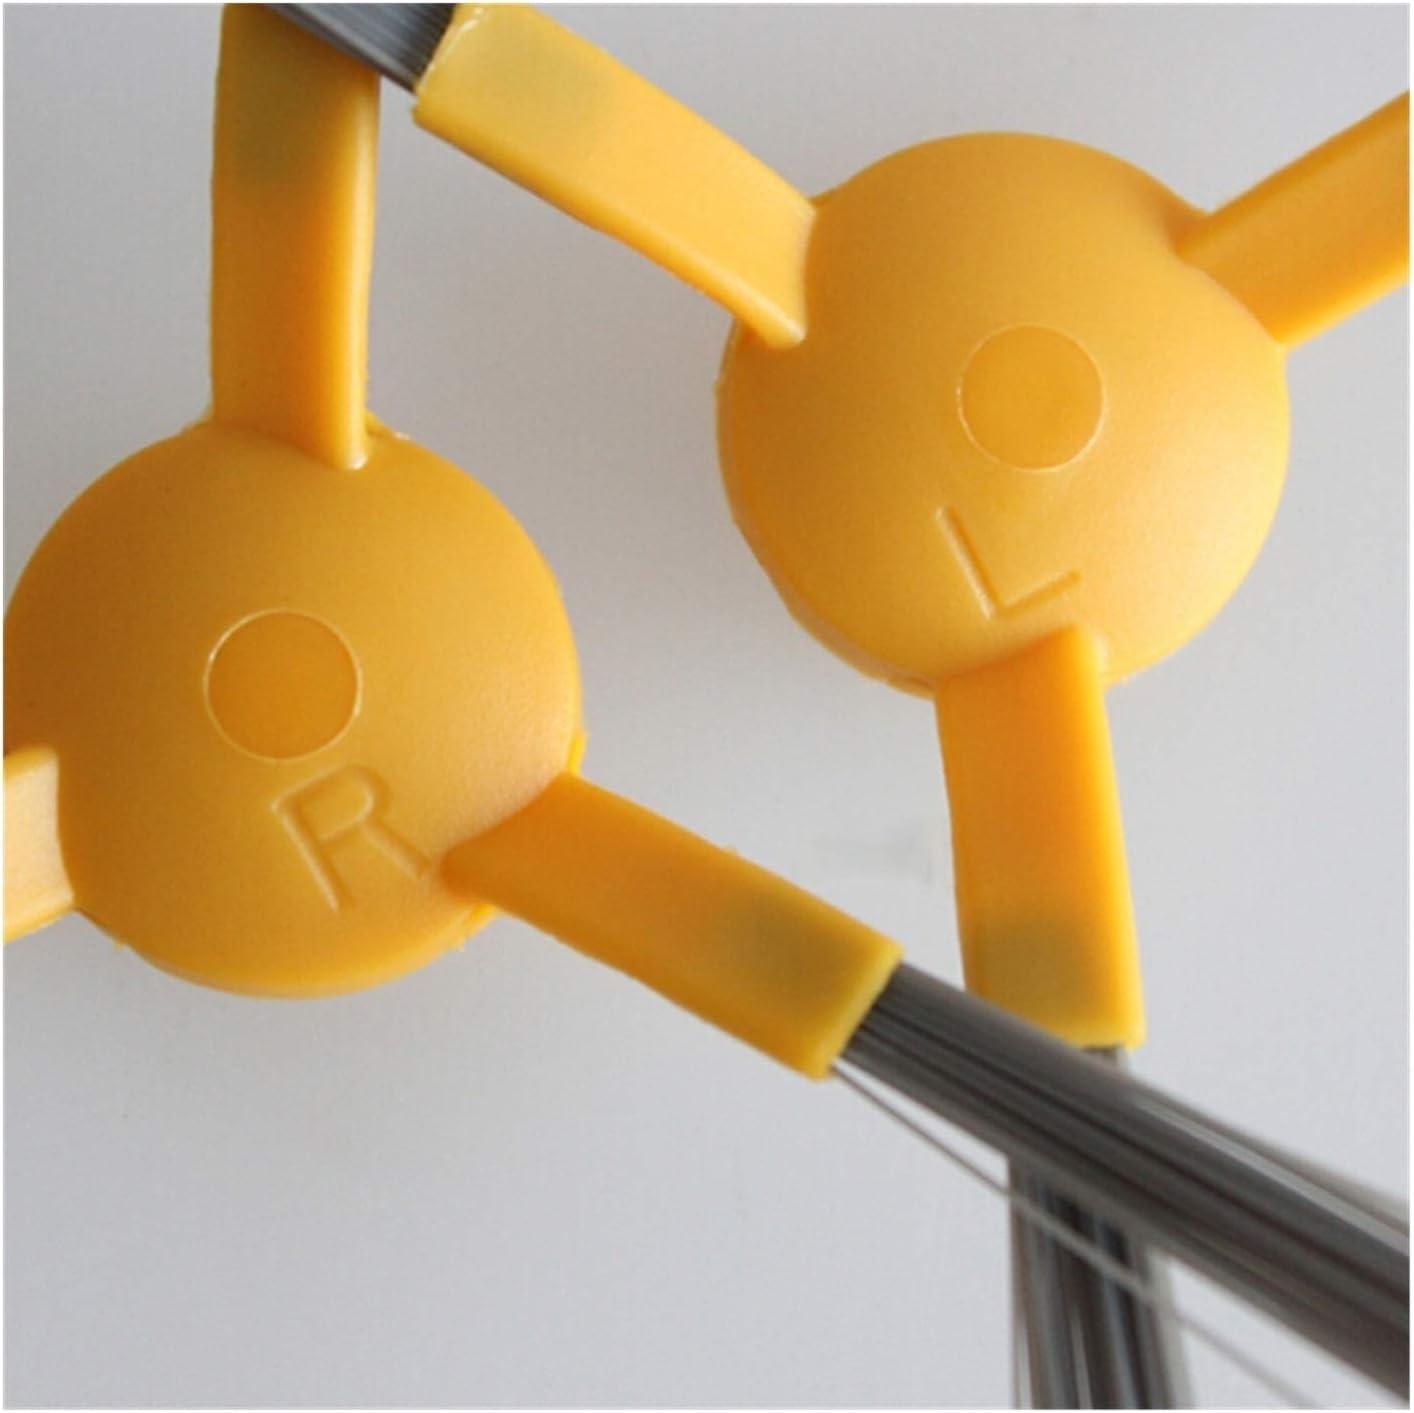 WQPY overseas Max 87% OFF Vacuum Cleaner Parts Filte Accessories